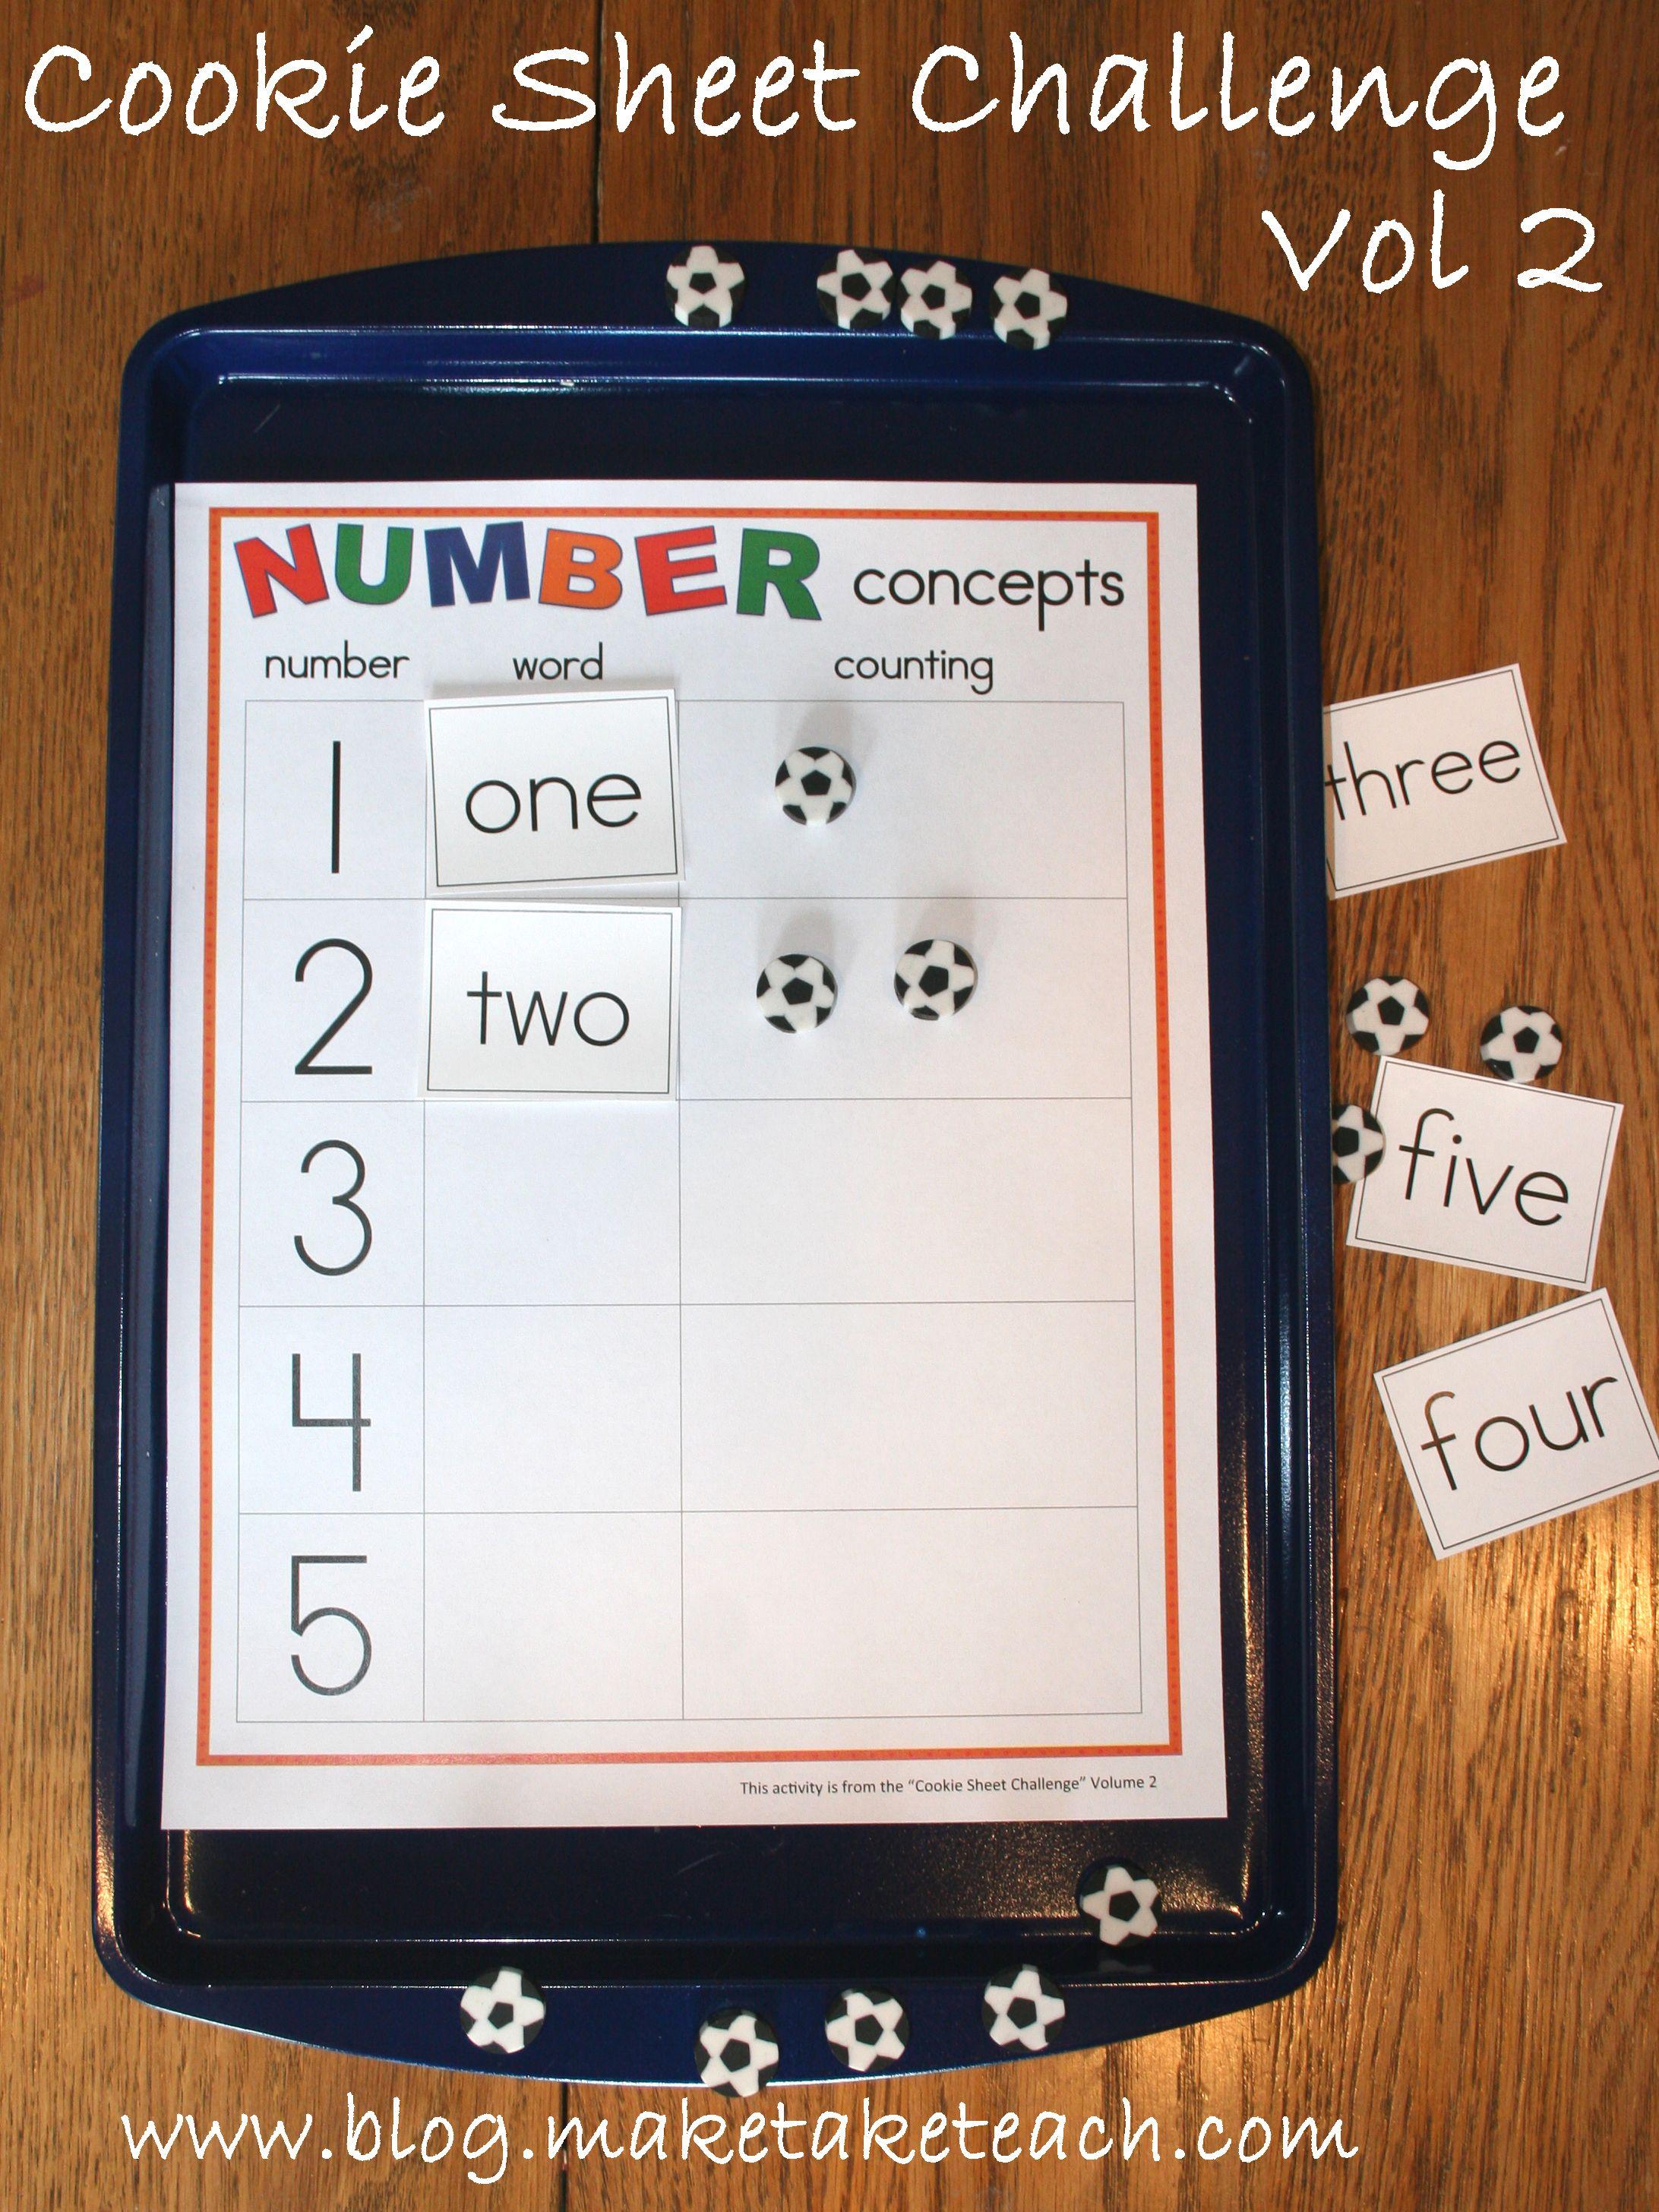 Cookie Sheet Challenge Volume 2 Number Order Number Concepts